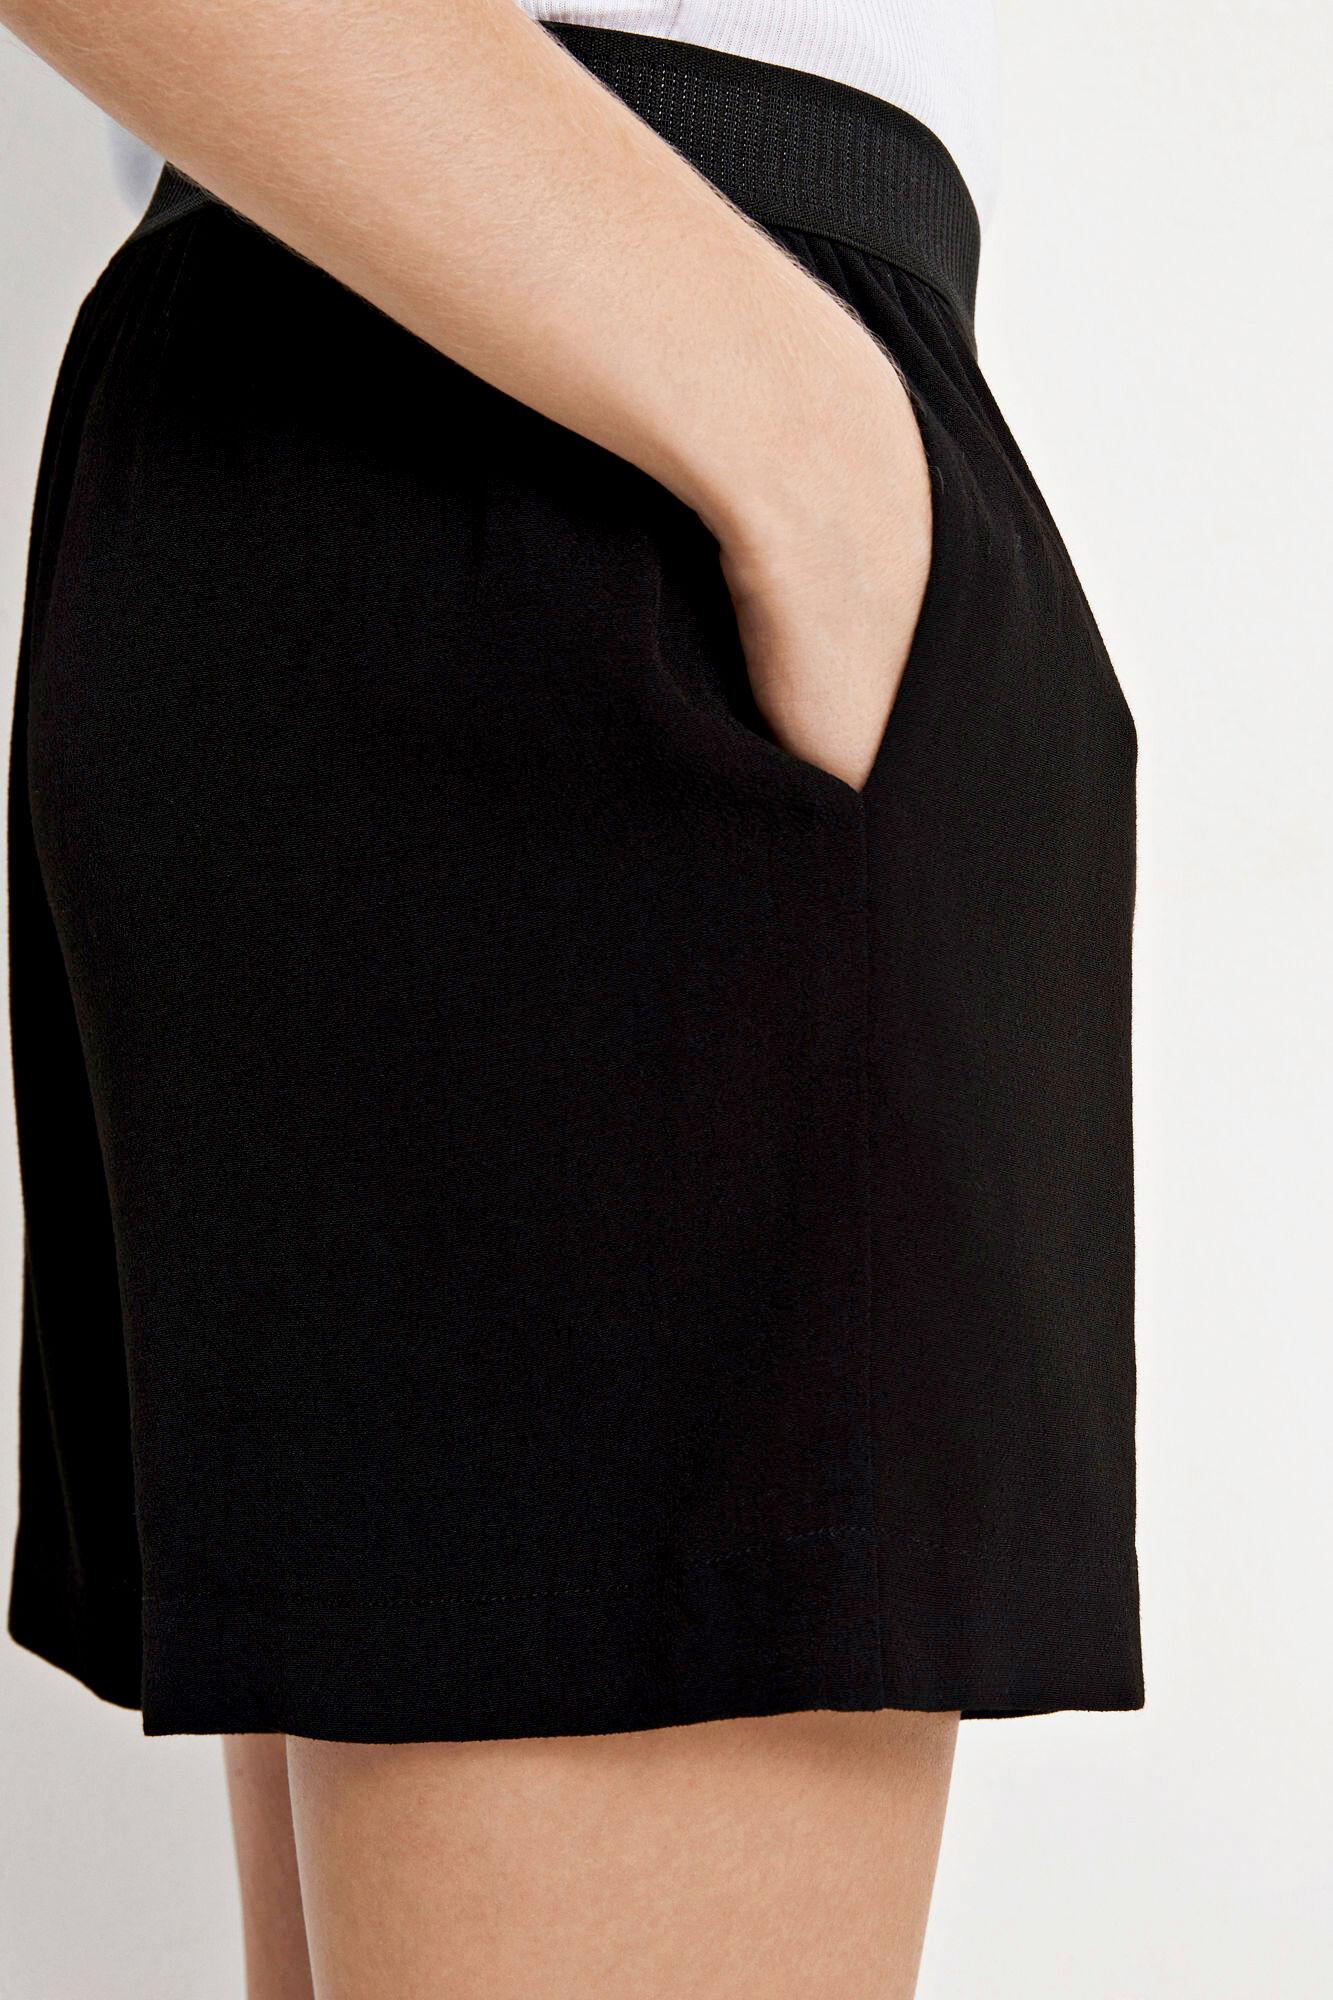 Nessie shorts 6515